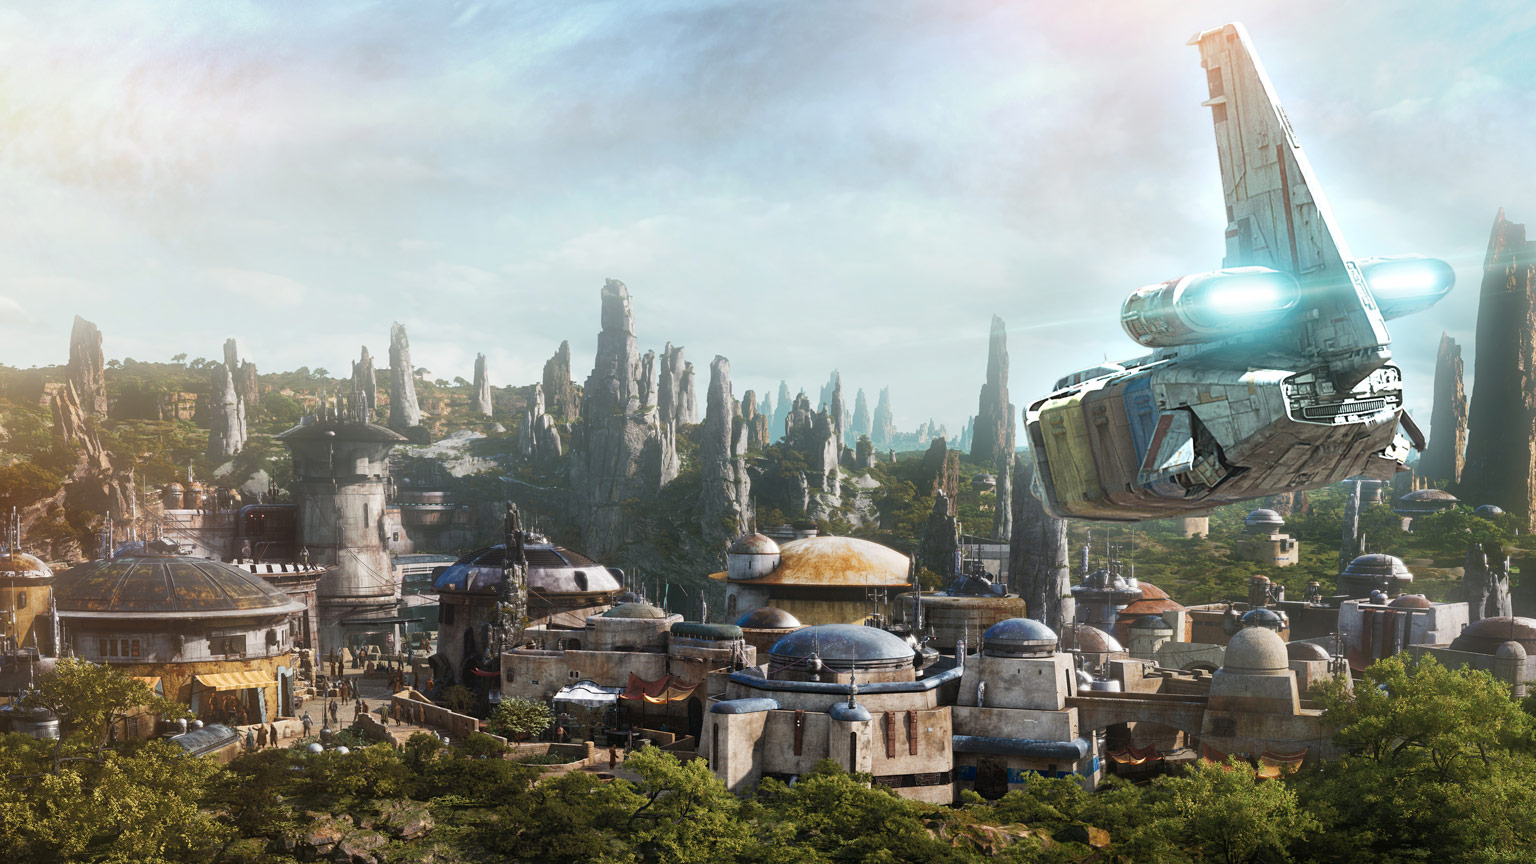 Batuu - Star Wars: Galaxy's Edge